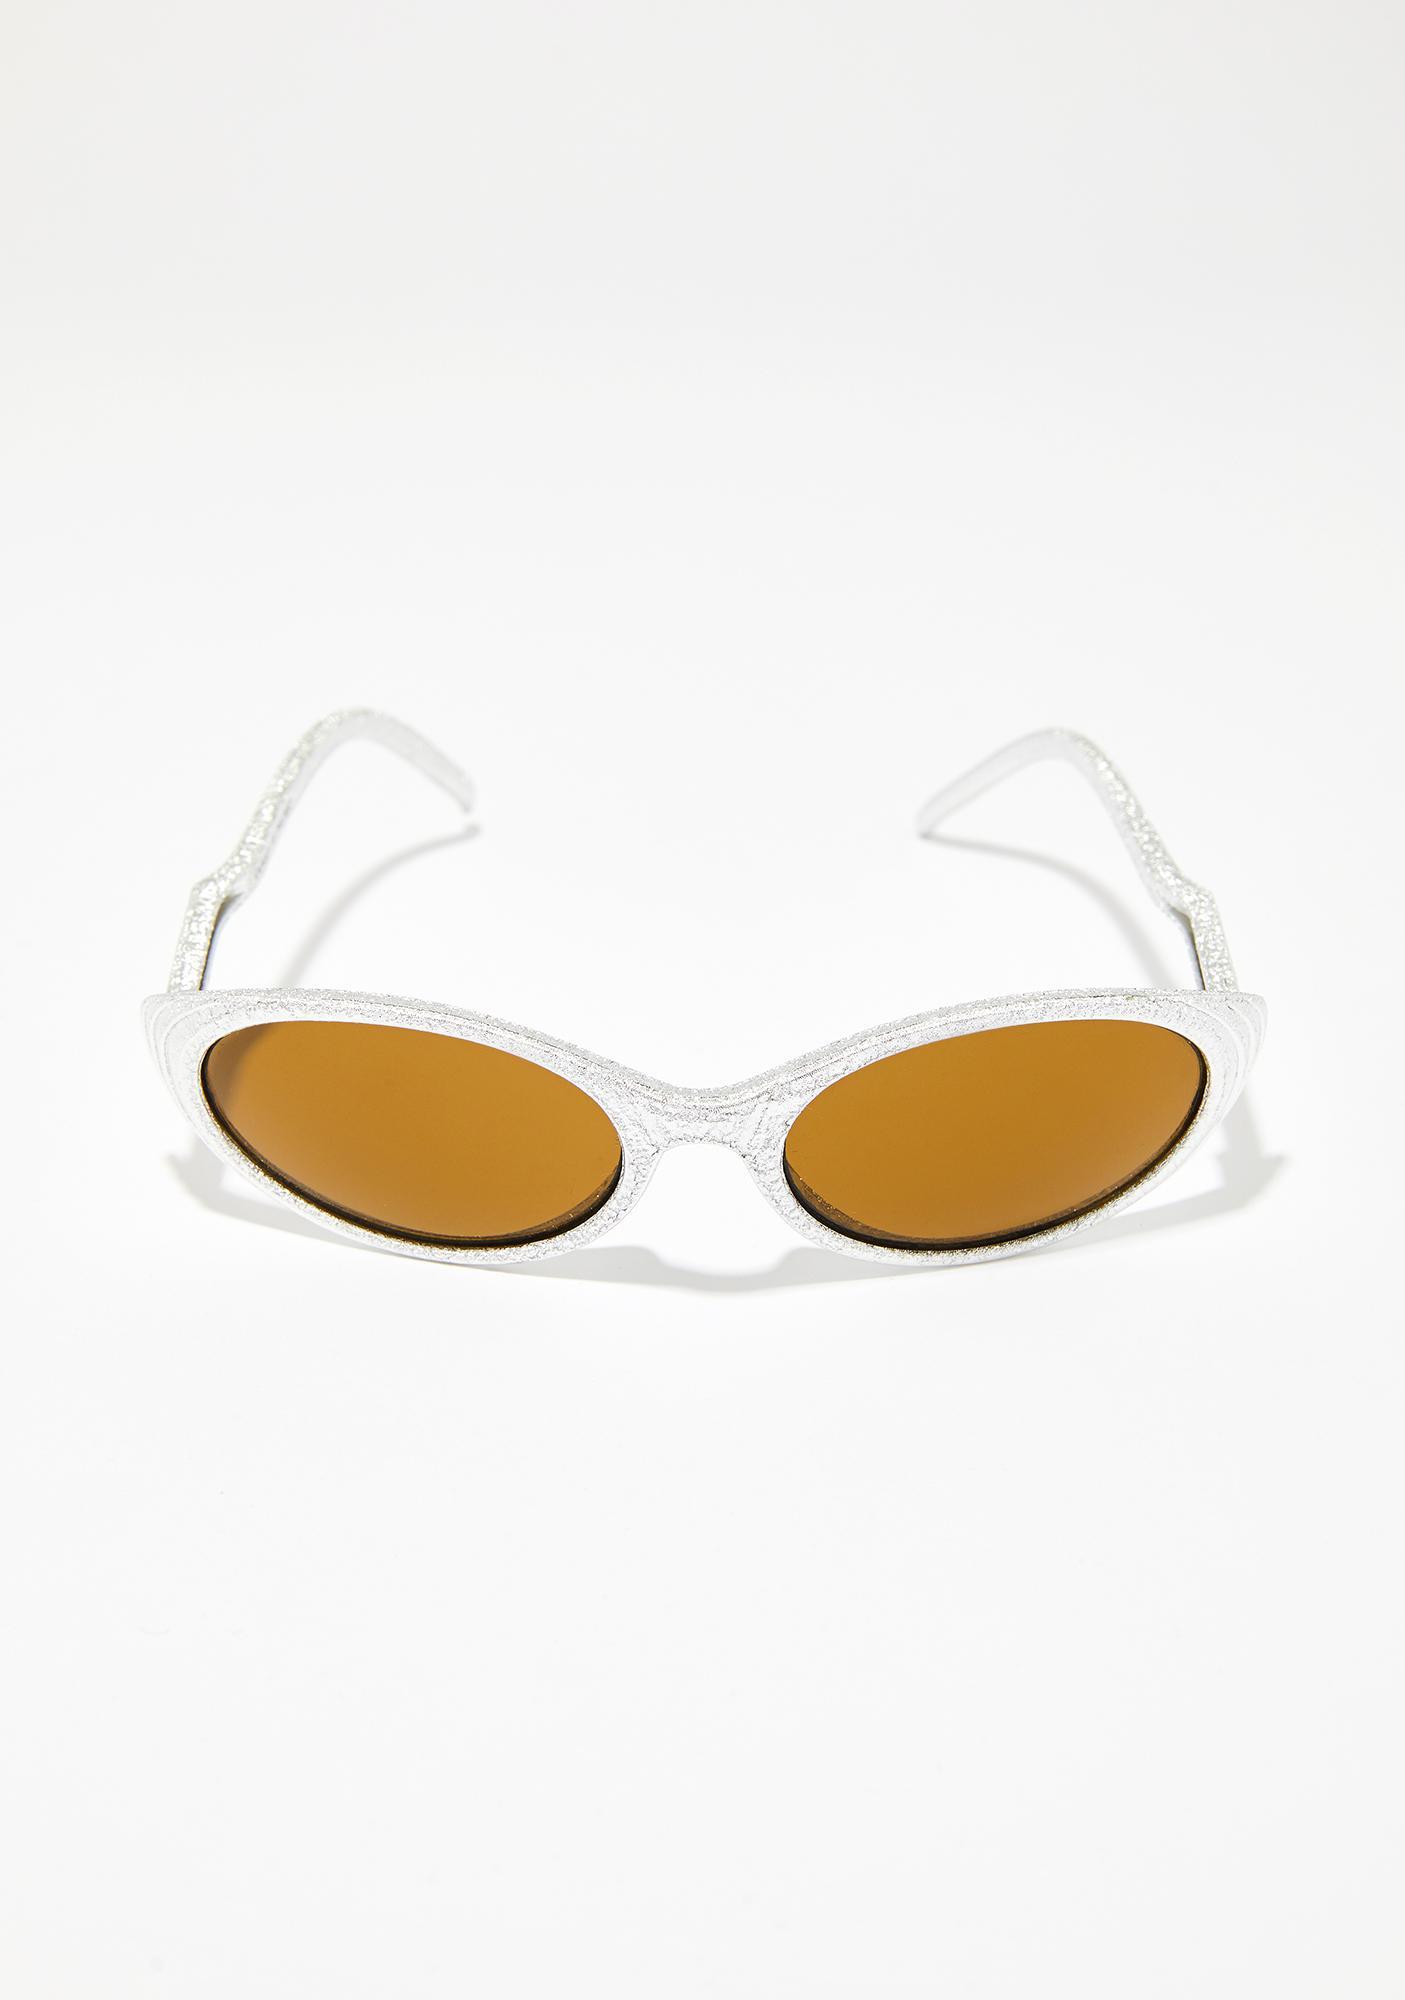 78e8de2b9a5 Clear Glitter Frame Gradient Cat Eye Sunglasses